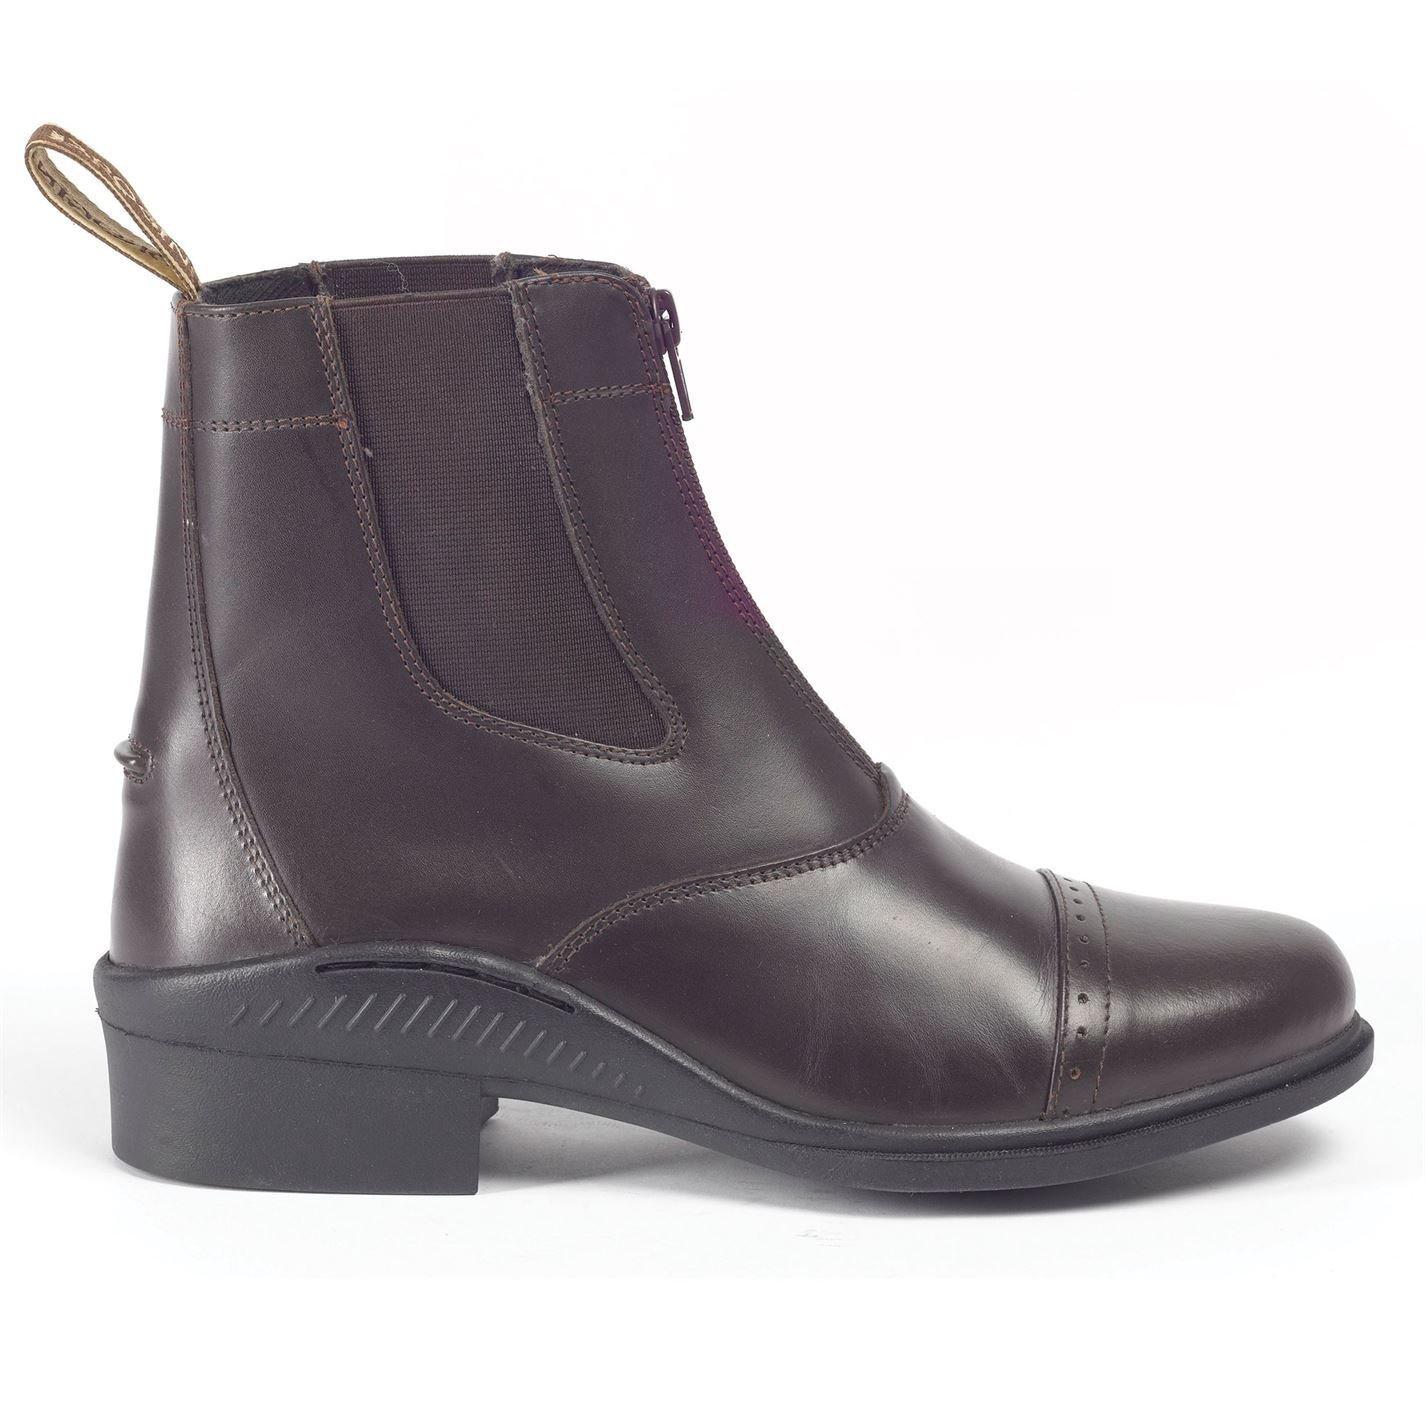 Brogini Tivoli Paddock Reiten Equestrian Stiefel Damen braun Equestrian Reiten Schuhe Schuhe - f18ba5